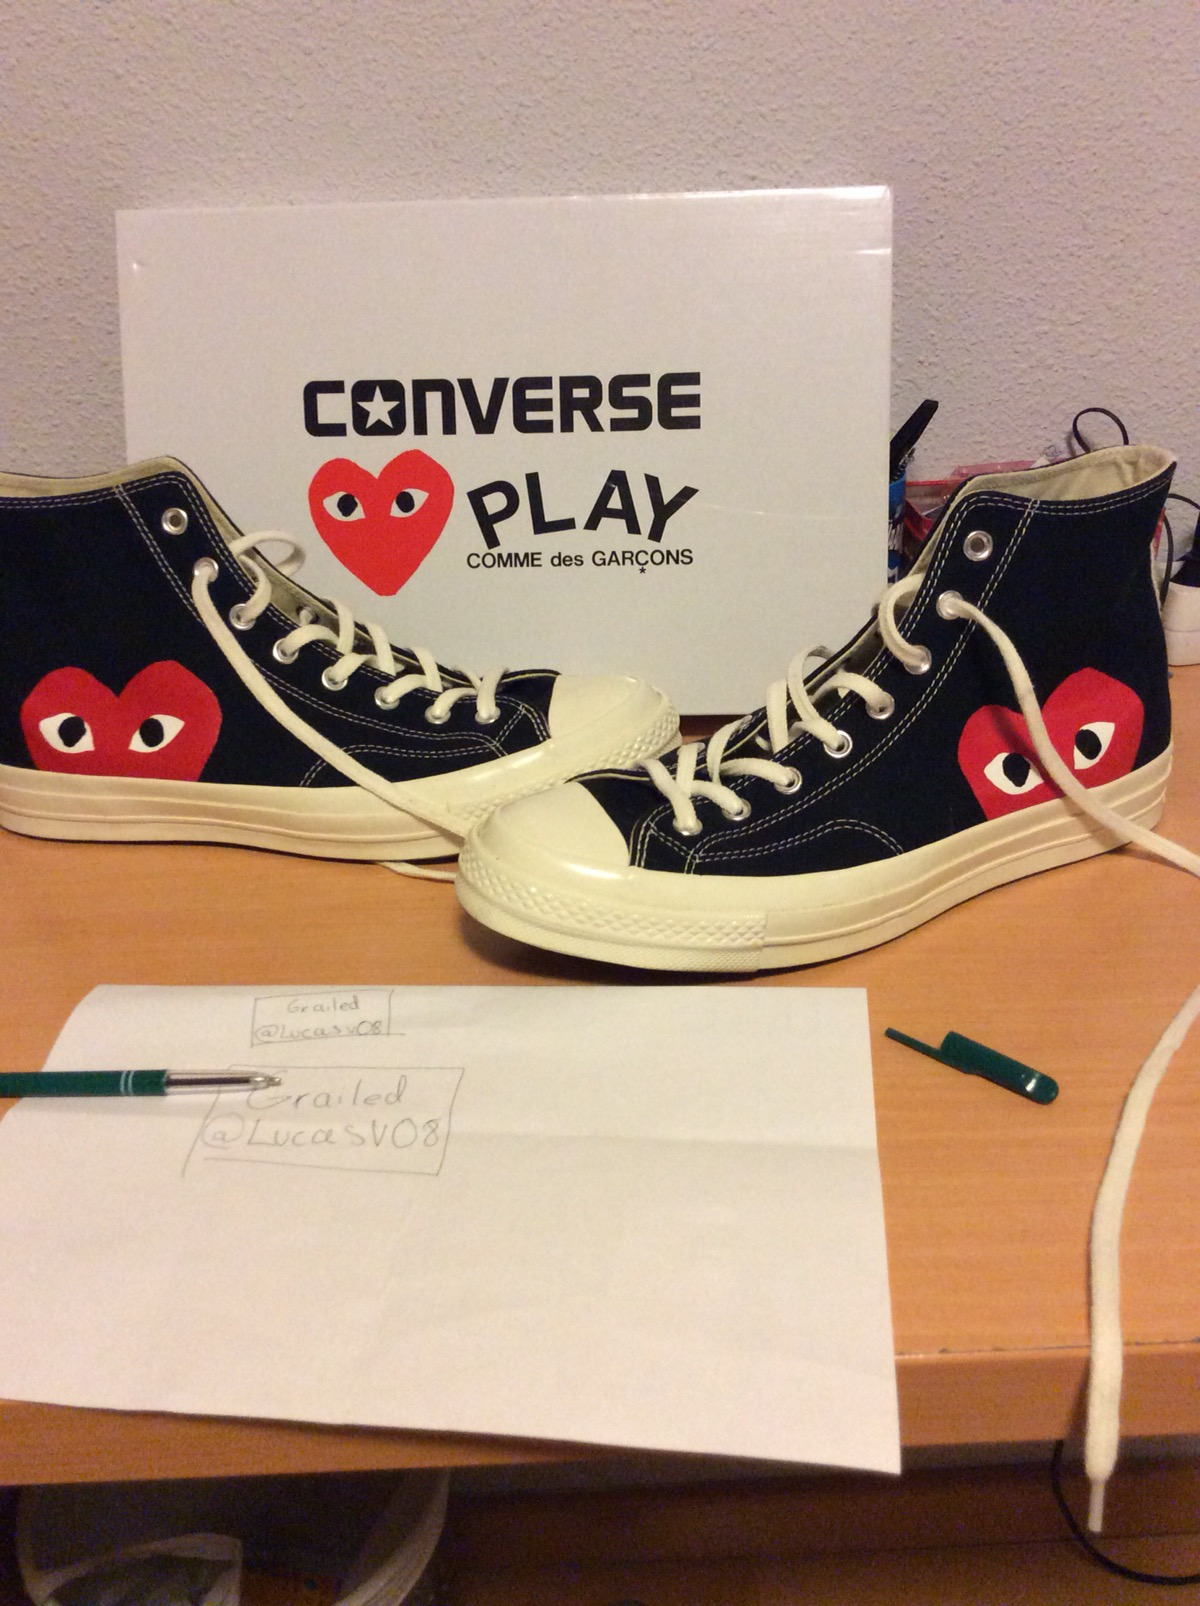 67de67682f6d Converse Comme Des Garçons PLAY X converse Chuck Taylor - Hidden Heart High  Top Sneaker Men 11 Women 13 M Black Canvas Size 11 - Hi-Top Sneakers for  Sale - ...